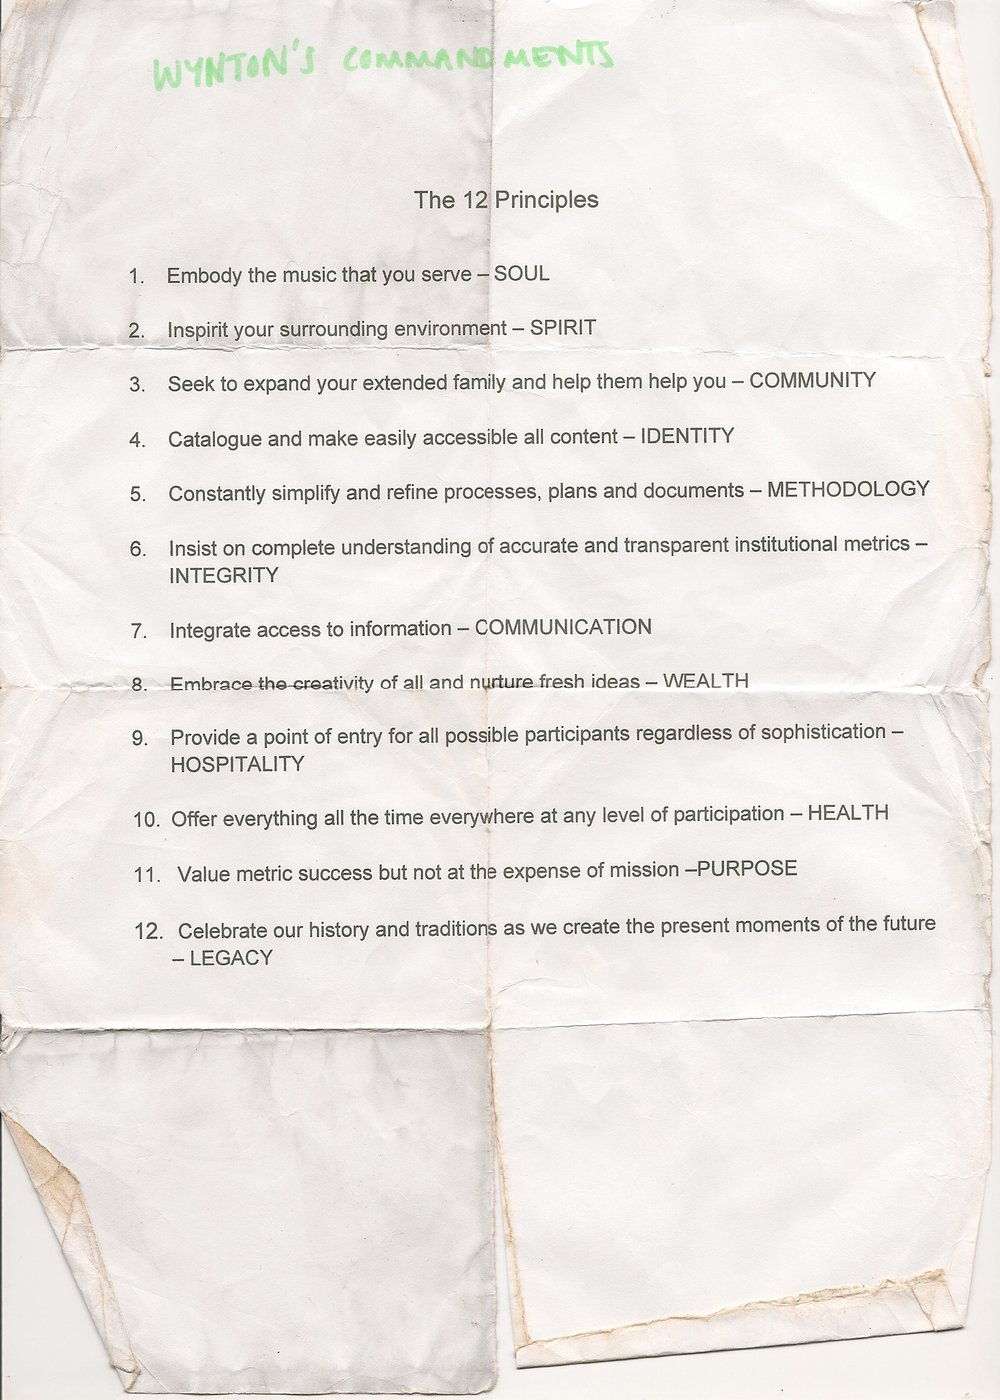 Wynton Marsalis Twelve Commandements - BW0001.jpg